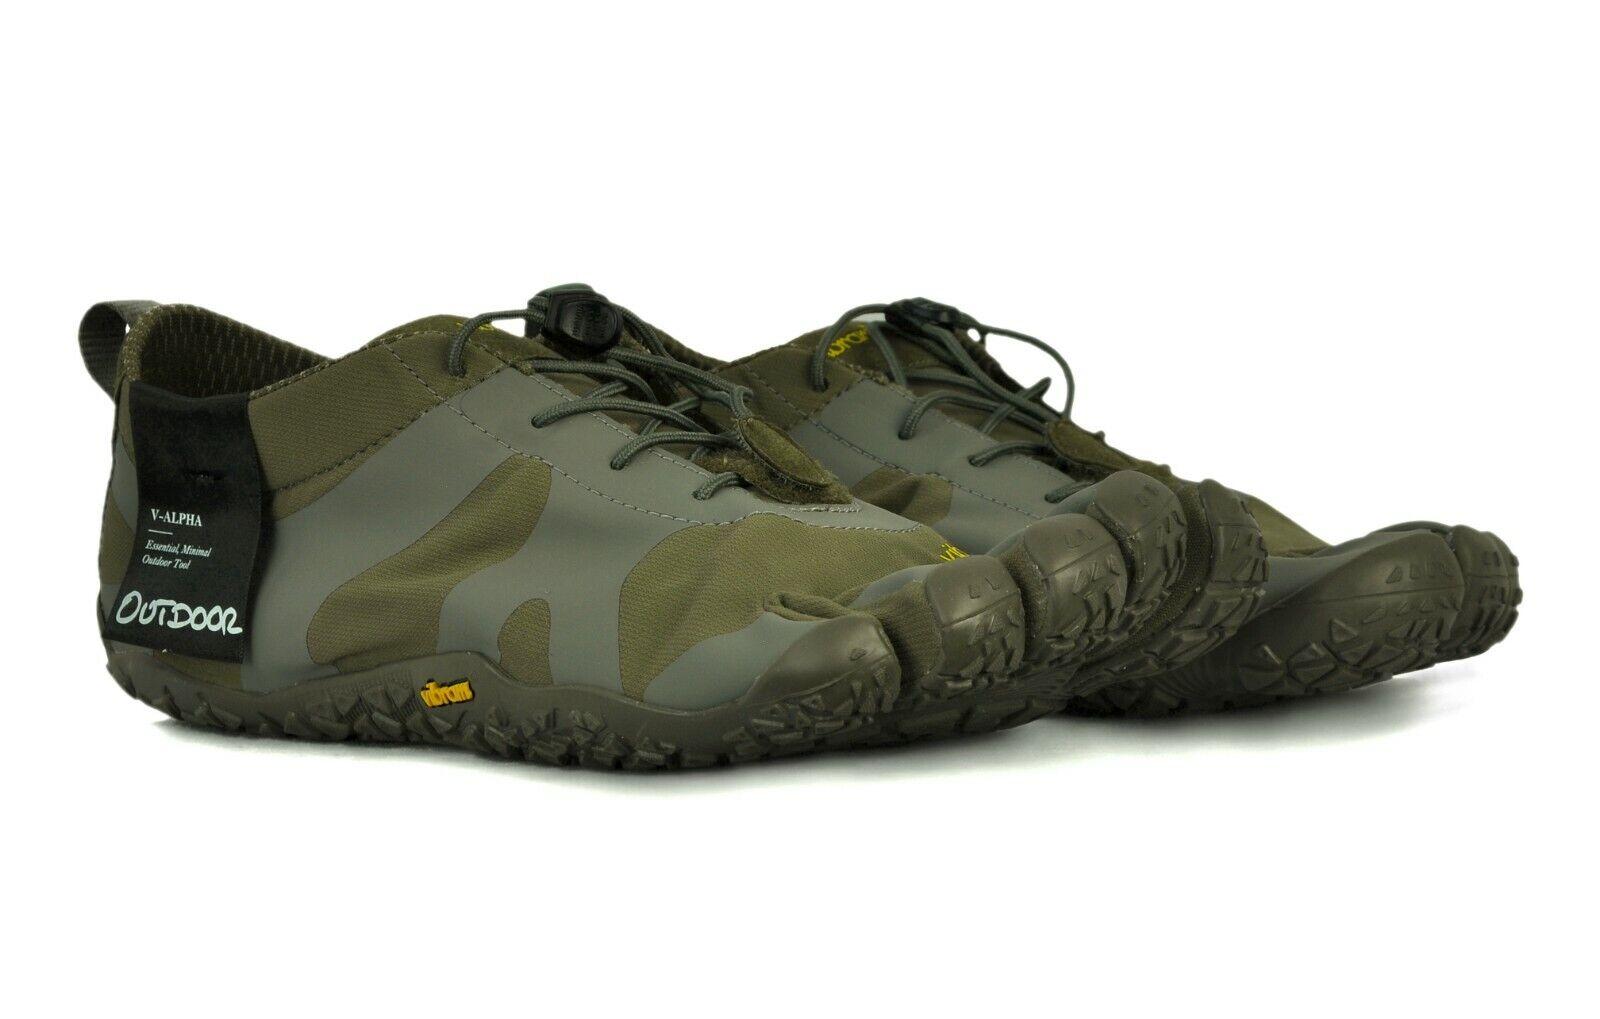 Vibram Fivefingers Hombre Zapatos V-Alfa M7103 militar gris  US 12-12.5